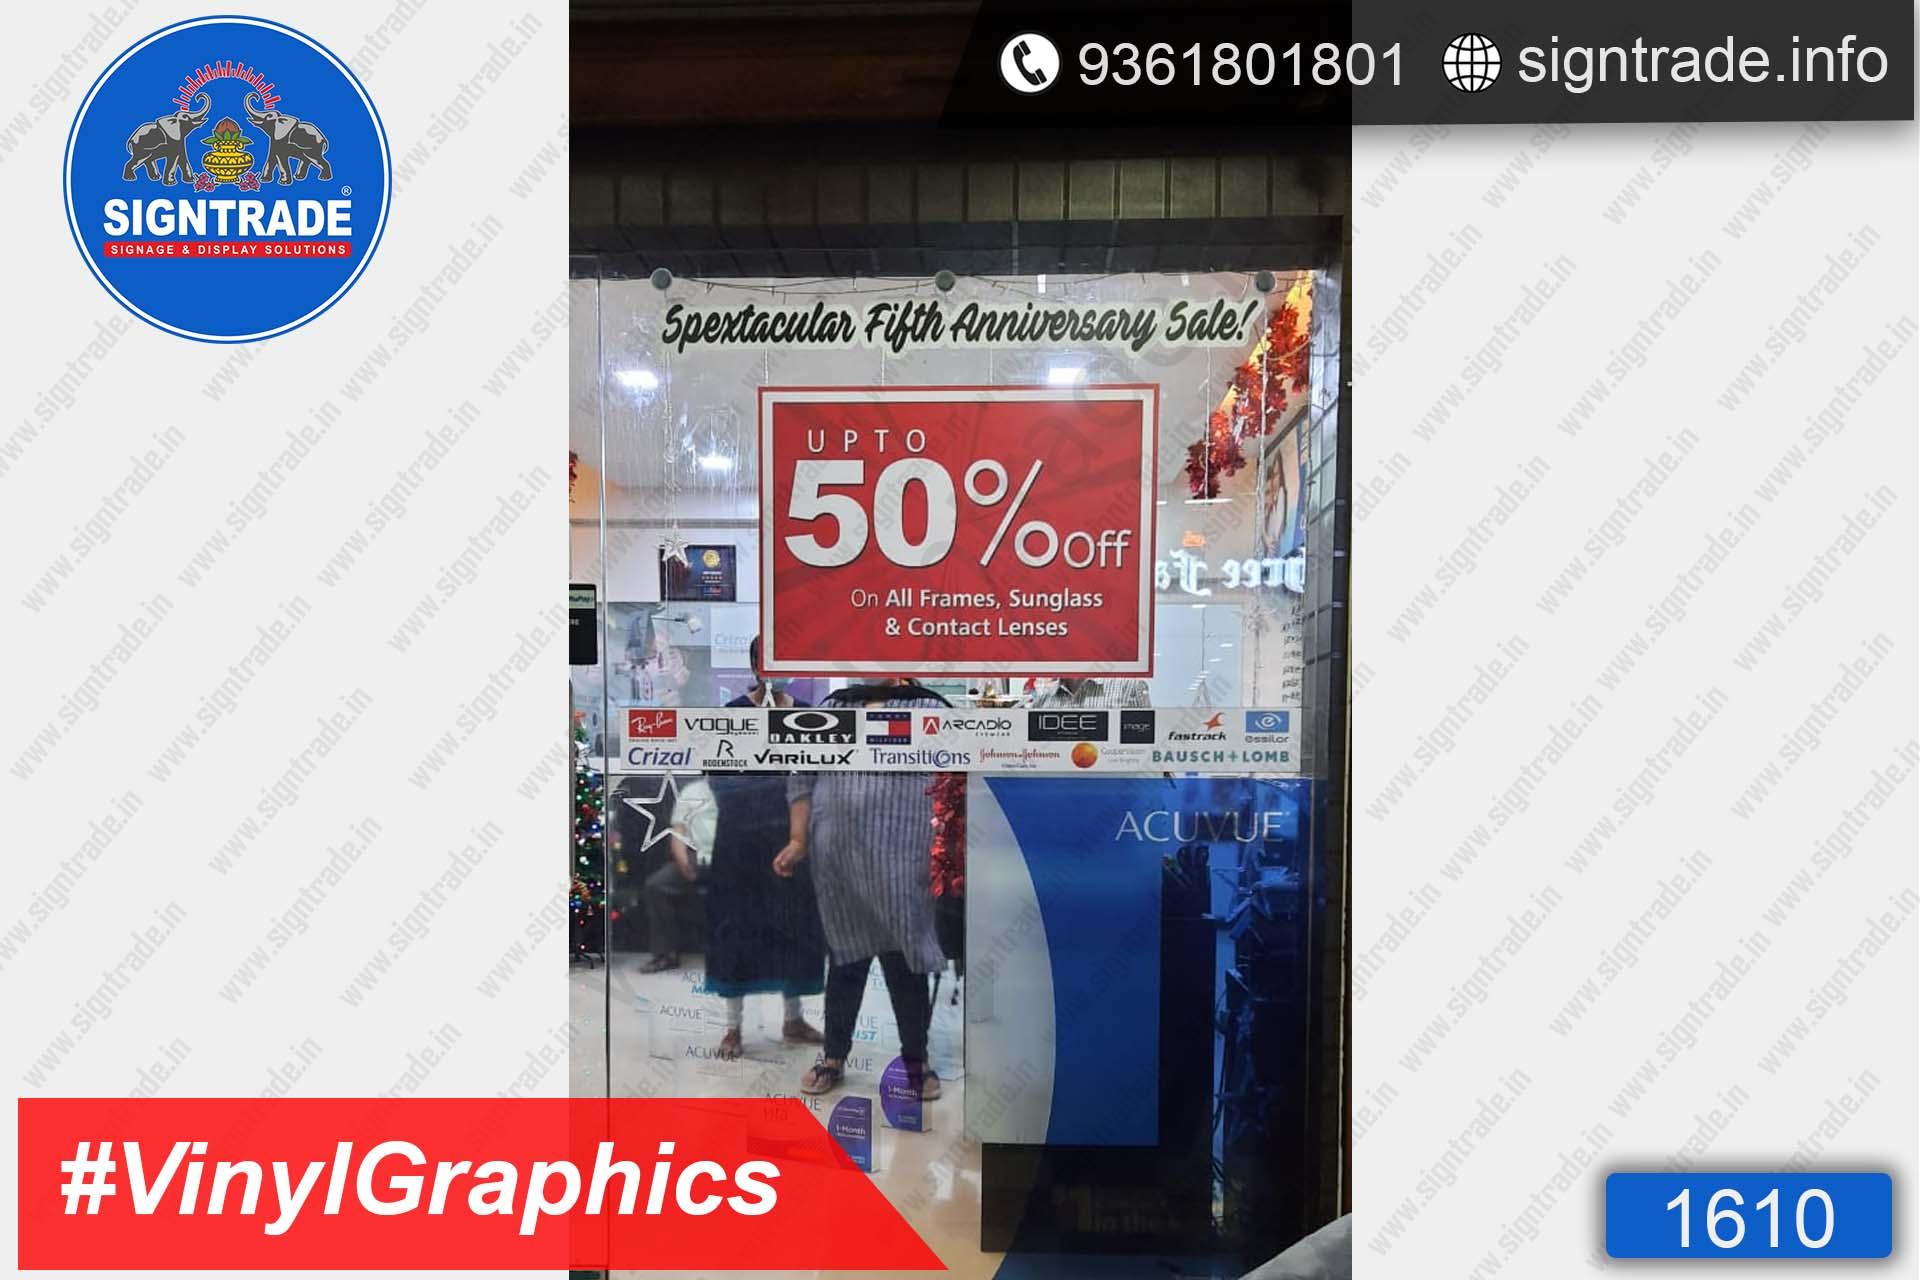 Discount Sticker - SIGNTRADE - Vinyl Printing, Digital Printing Service in Chennai